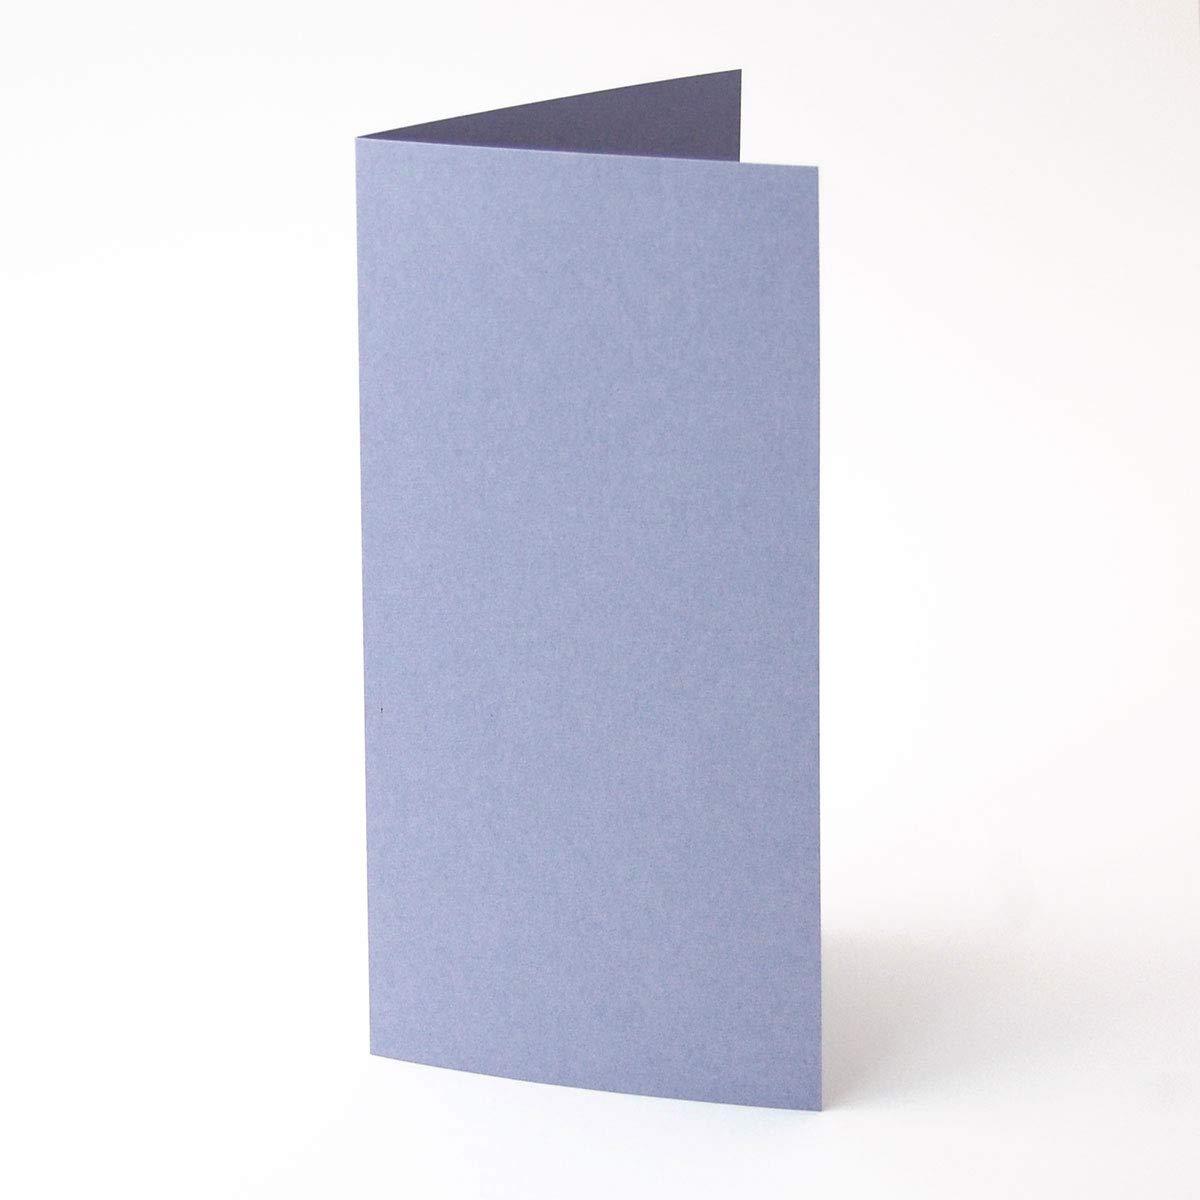 100 fliederblaue Blanko-Grußkarten DIN lang, GmundFarbes Nr.44, 200 g qm, edles Material, durchgefärbter Karton, (21 x 10,5 cm, offen 21 x 21 cm) B00SXEJ3F8 | New Product 2019